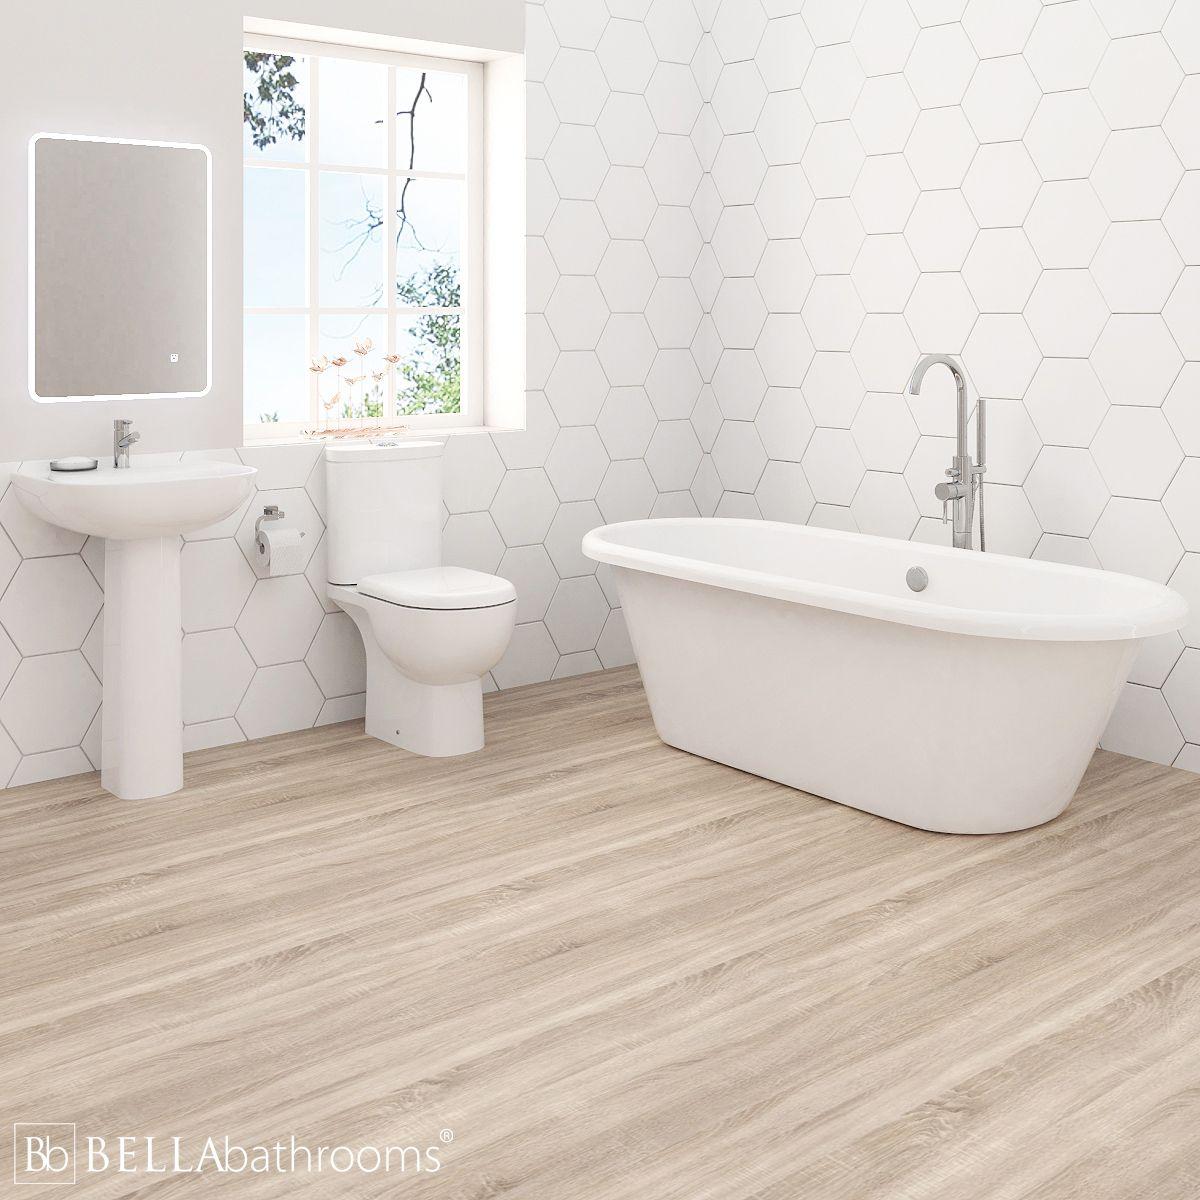 RAK Tonique Bathroom Suite with Haworth Freestanding Bath